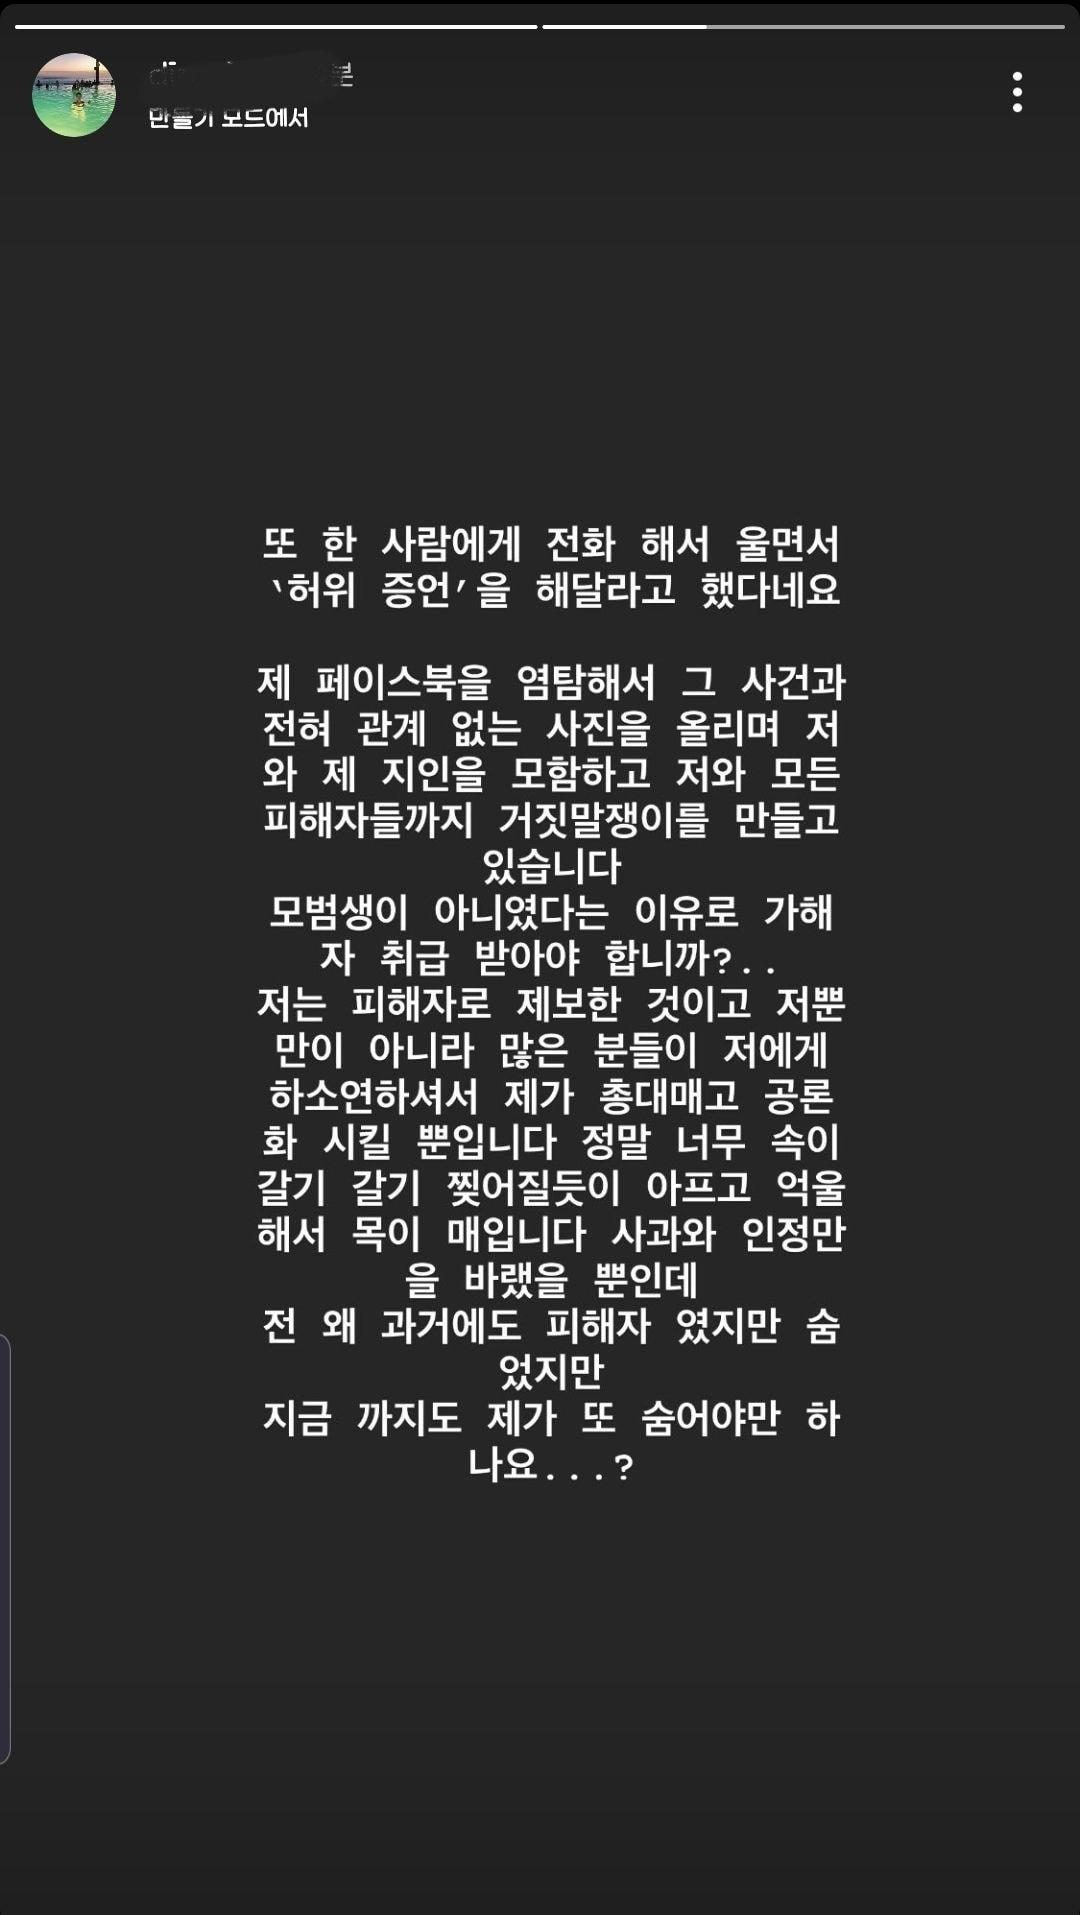 Screenshot_20210309-070359_Instagram.jpg